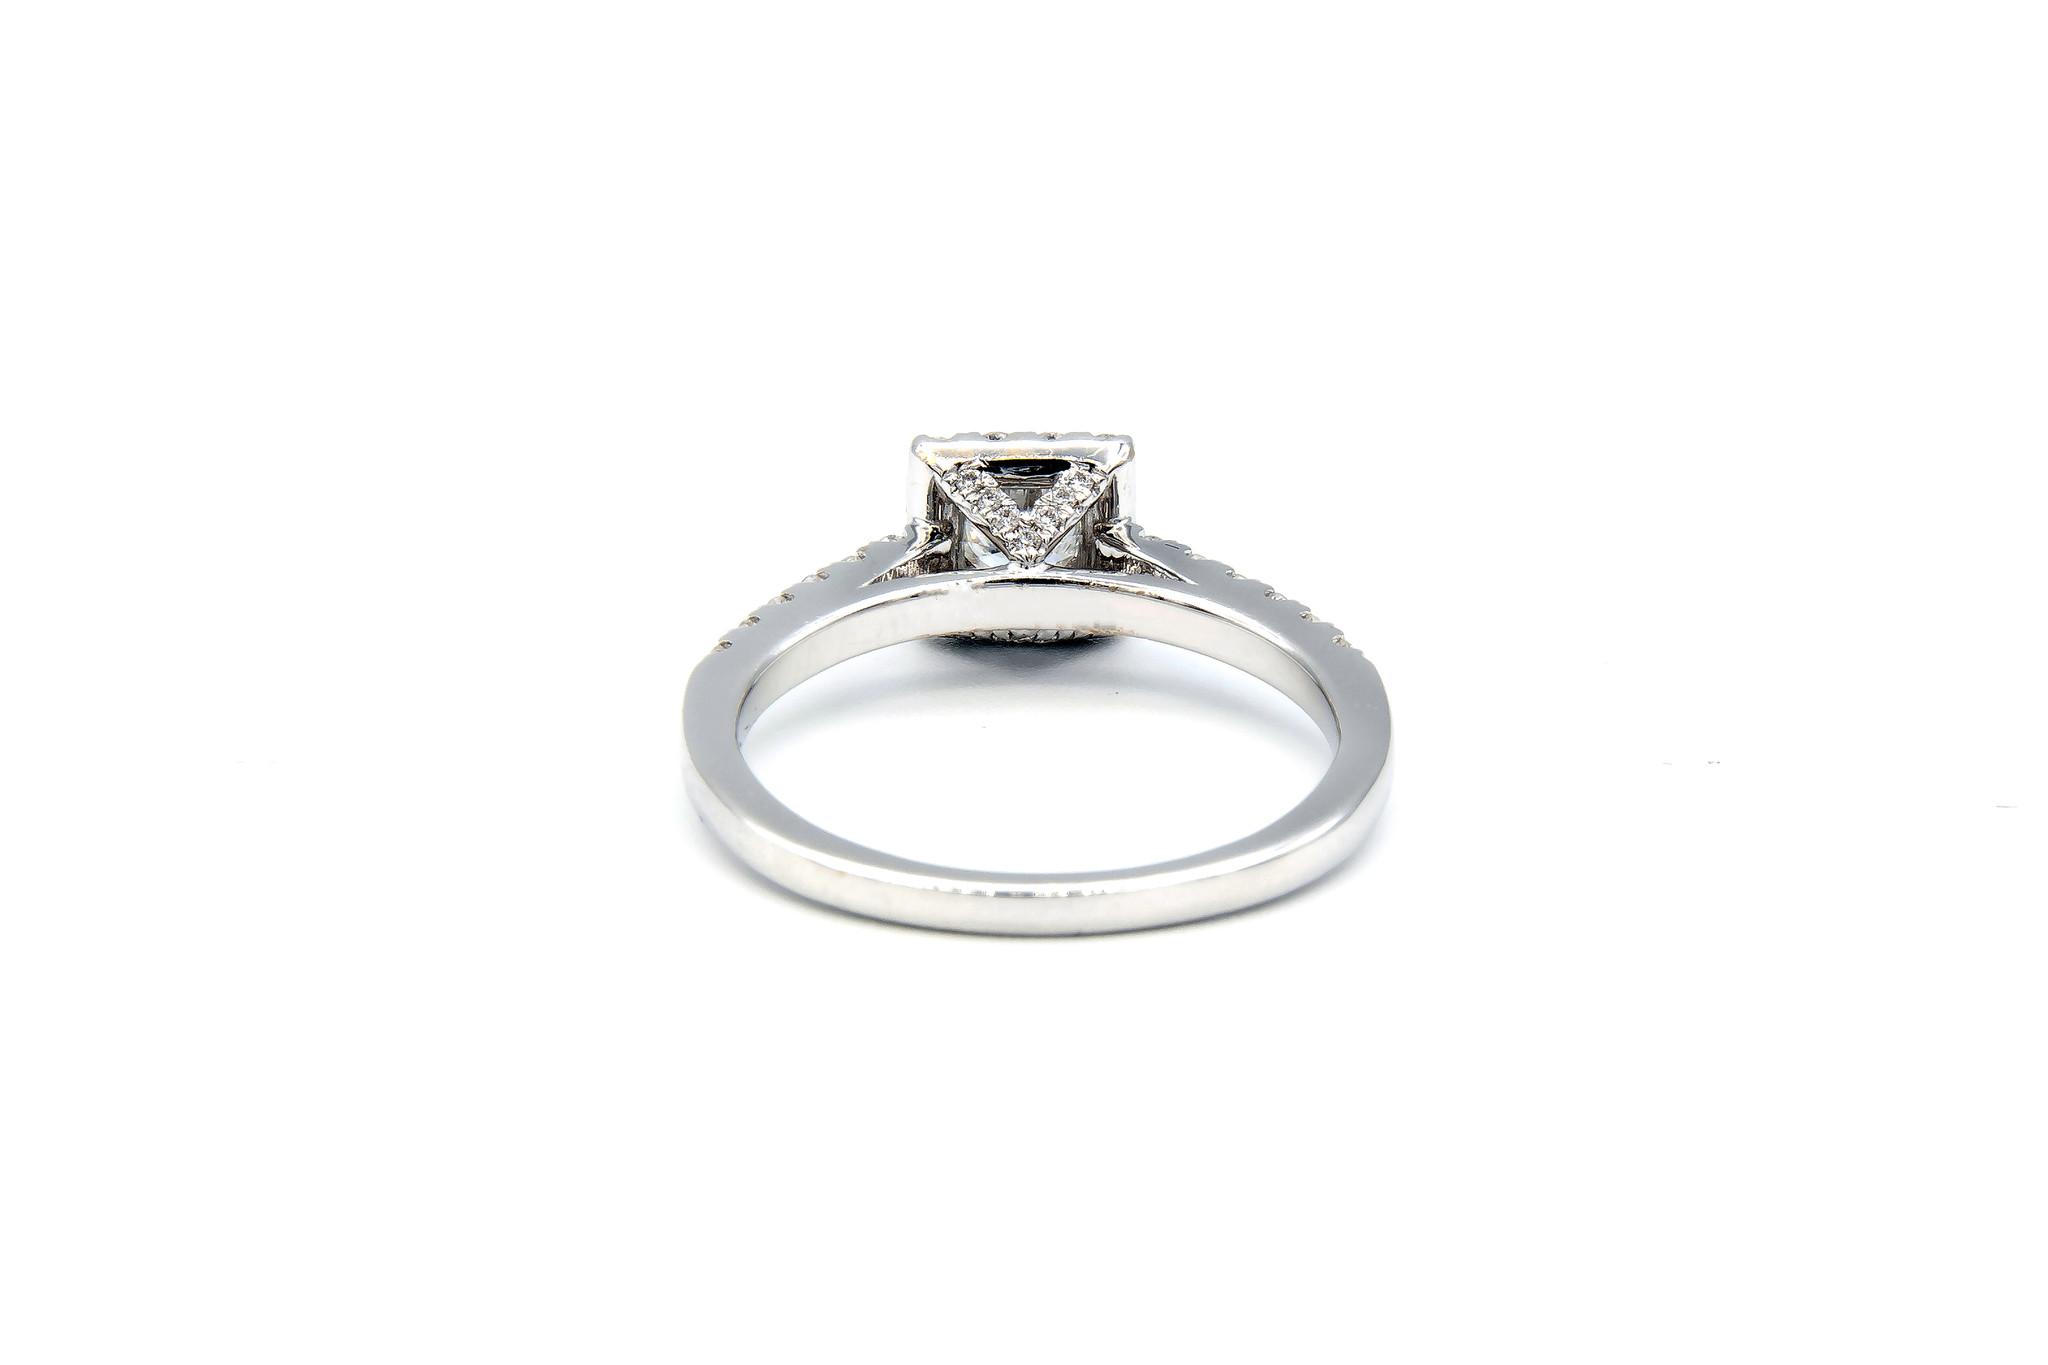 Ring verlovingsring witgoud met 0,2 ct SI en 0,28 ct VS diamant-5